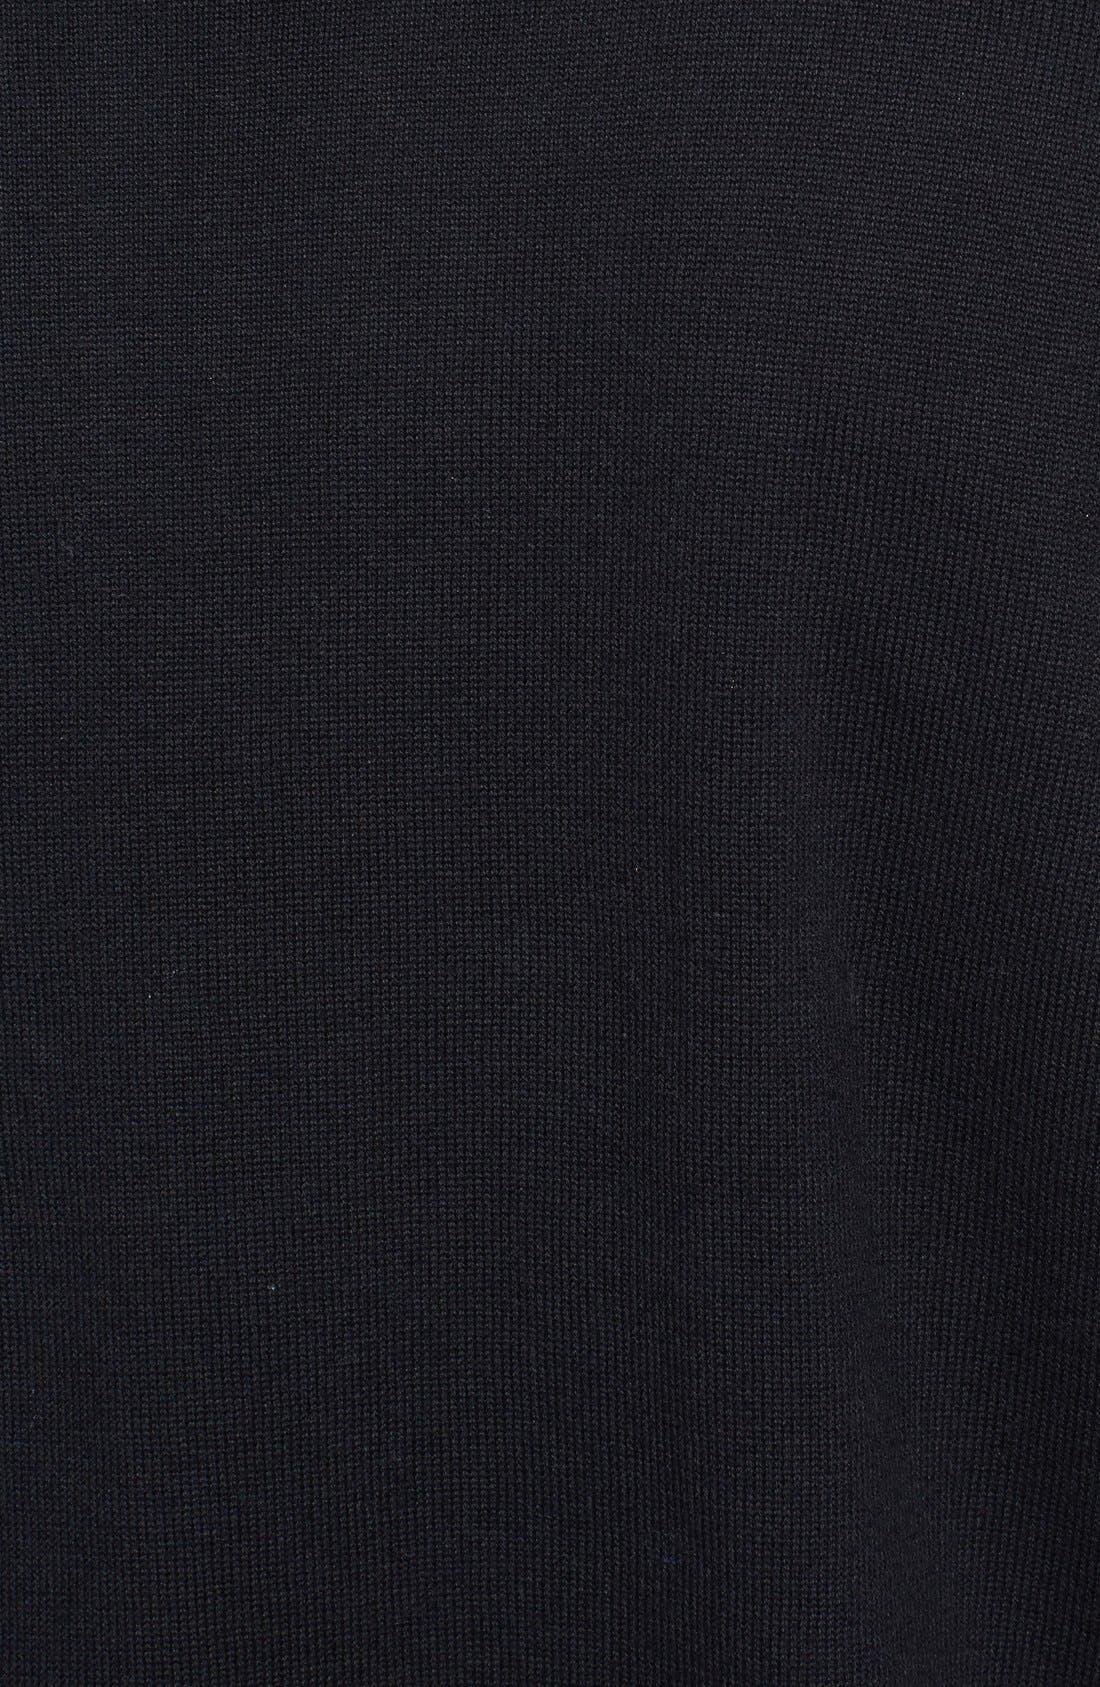 Broadview V-Neck Sweater,                             Alternate thumbnail 3, color,                             001